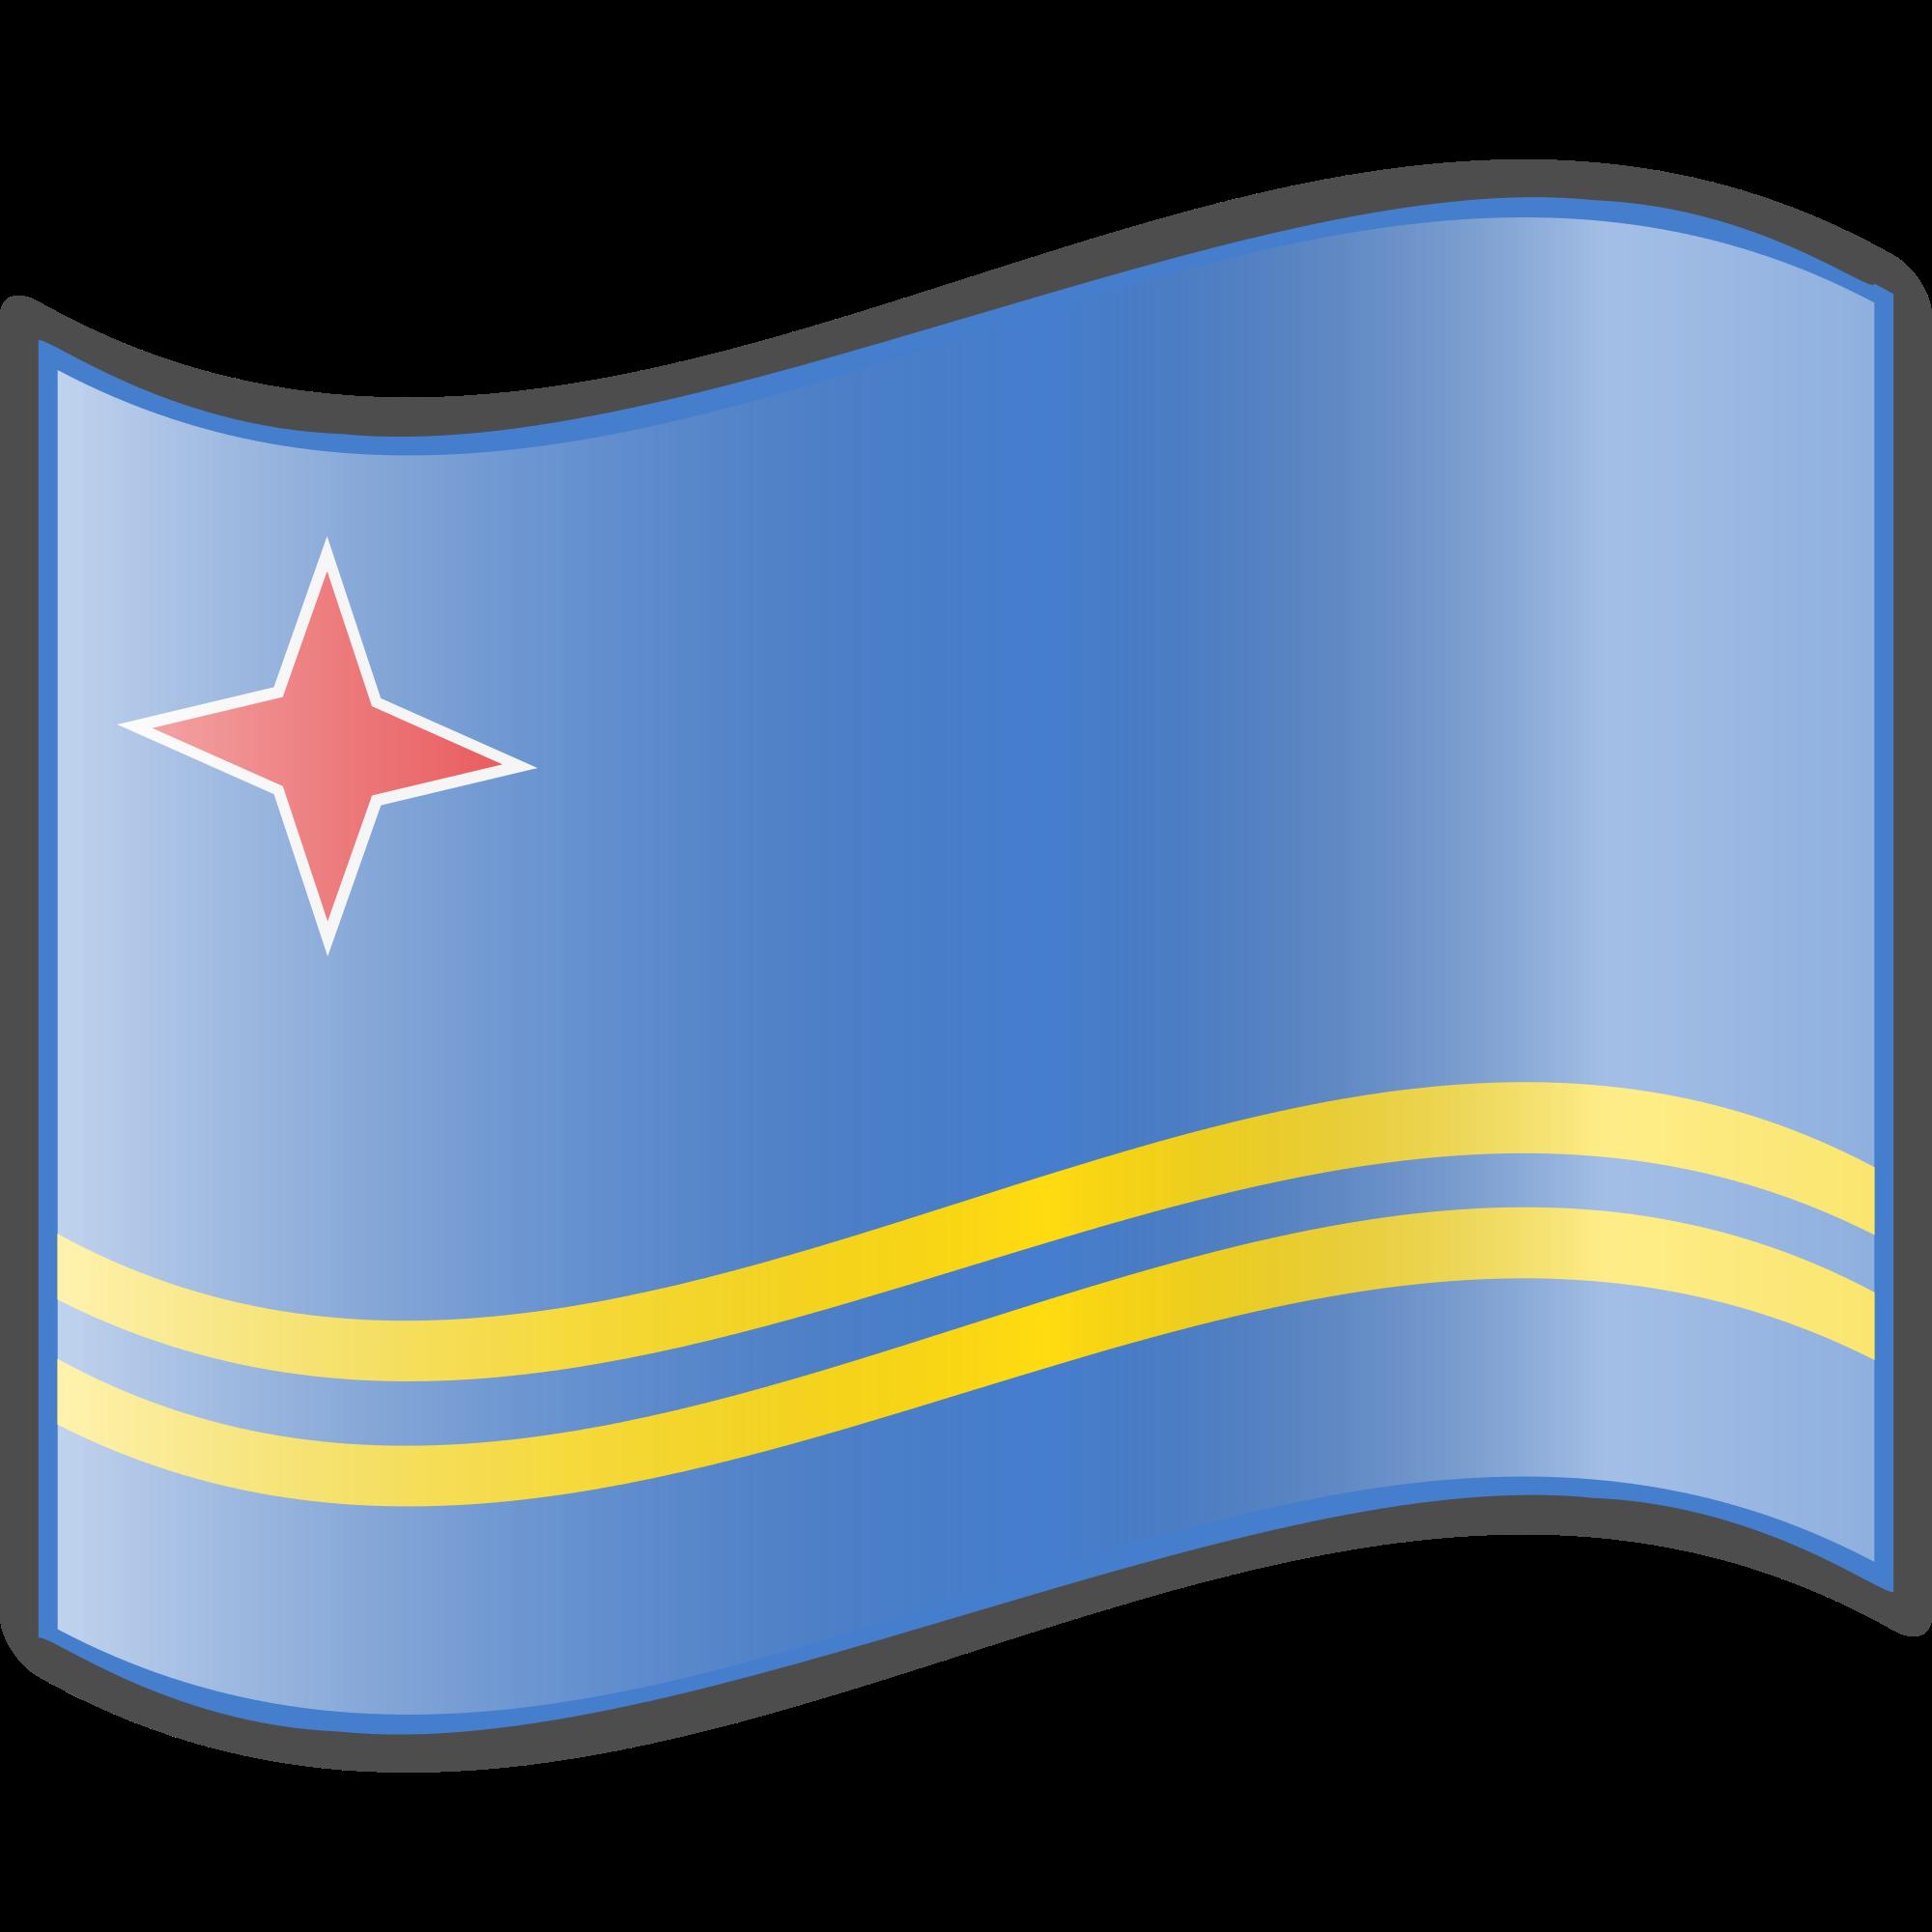 Clipart svg aruba flag clip art library library File:Nuvola Aruban flag.svg - Wikimedia Commons clip art library library